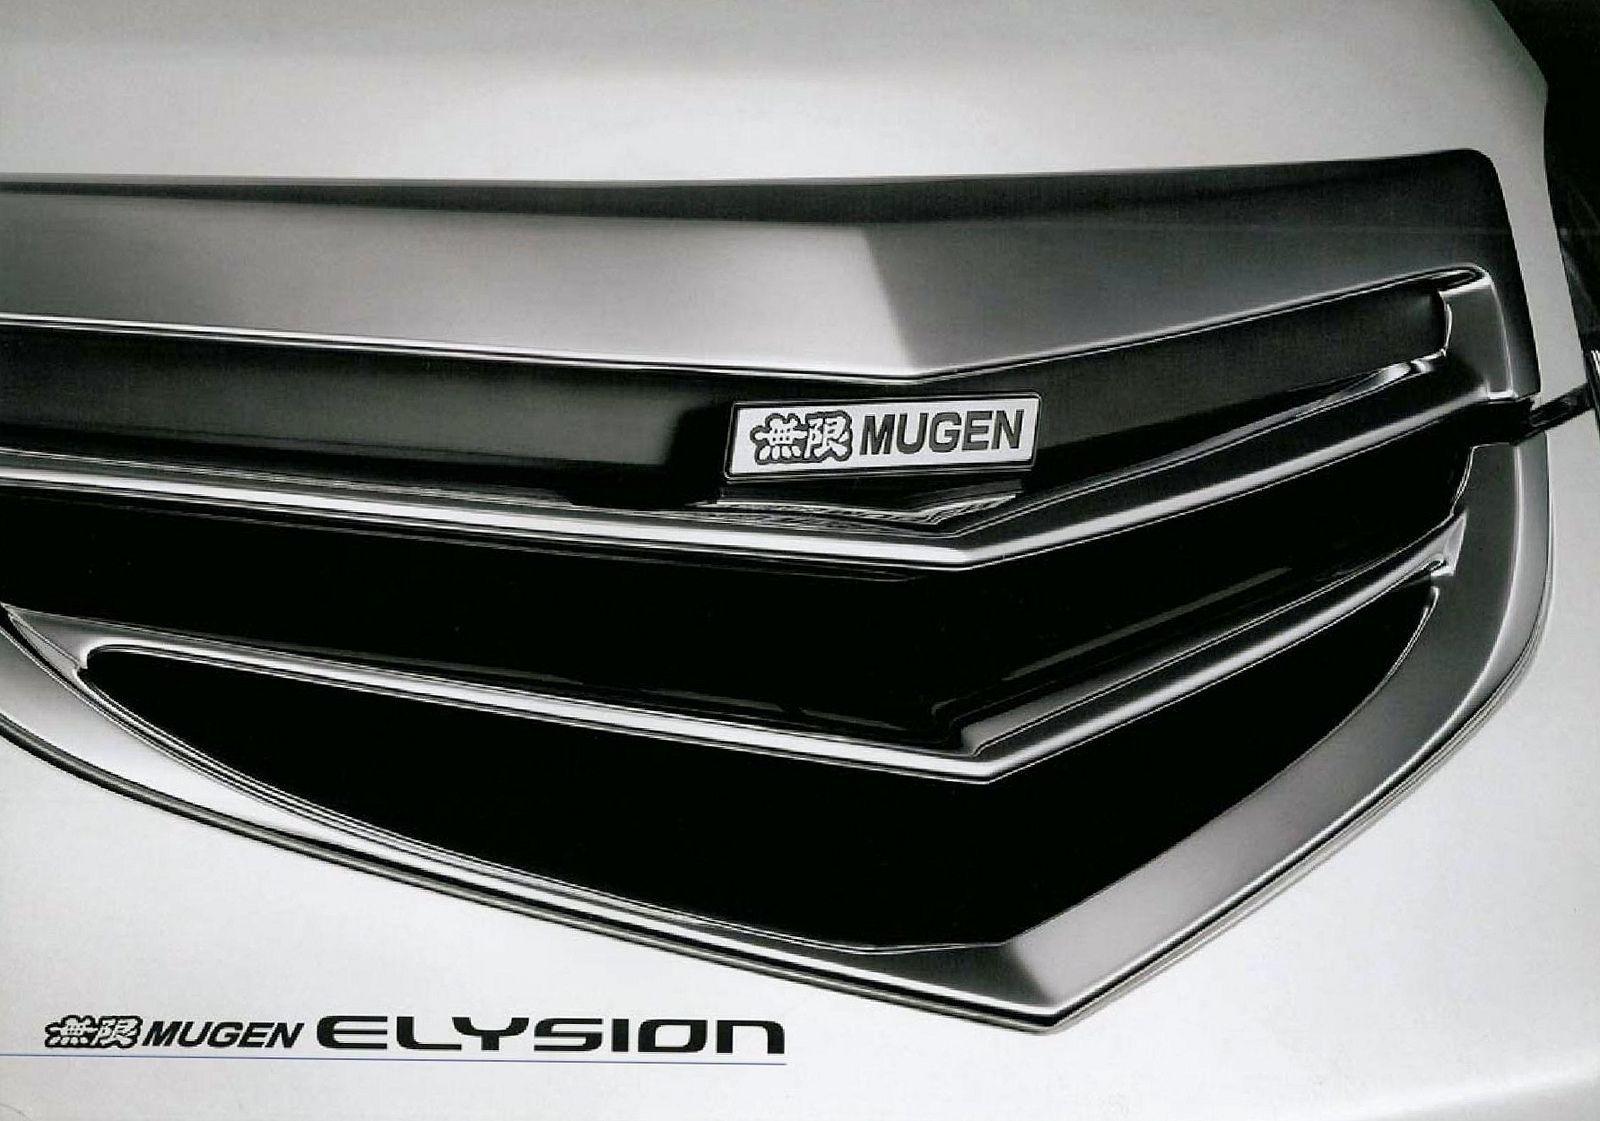 Honda Mugen Elysion Japan Brochure 2005